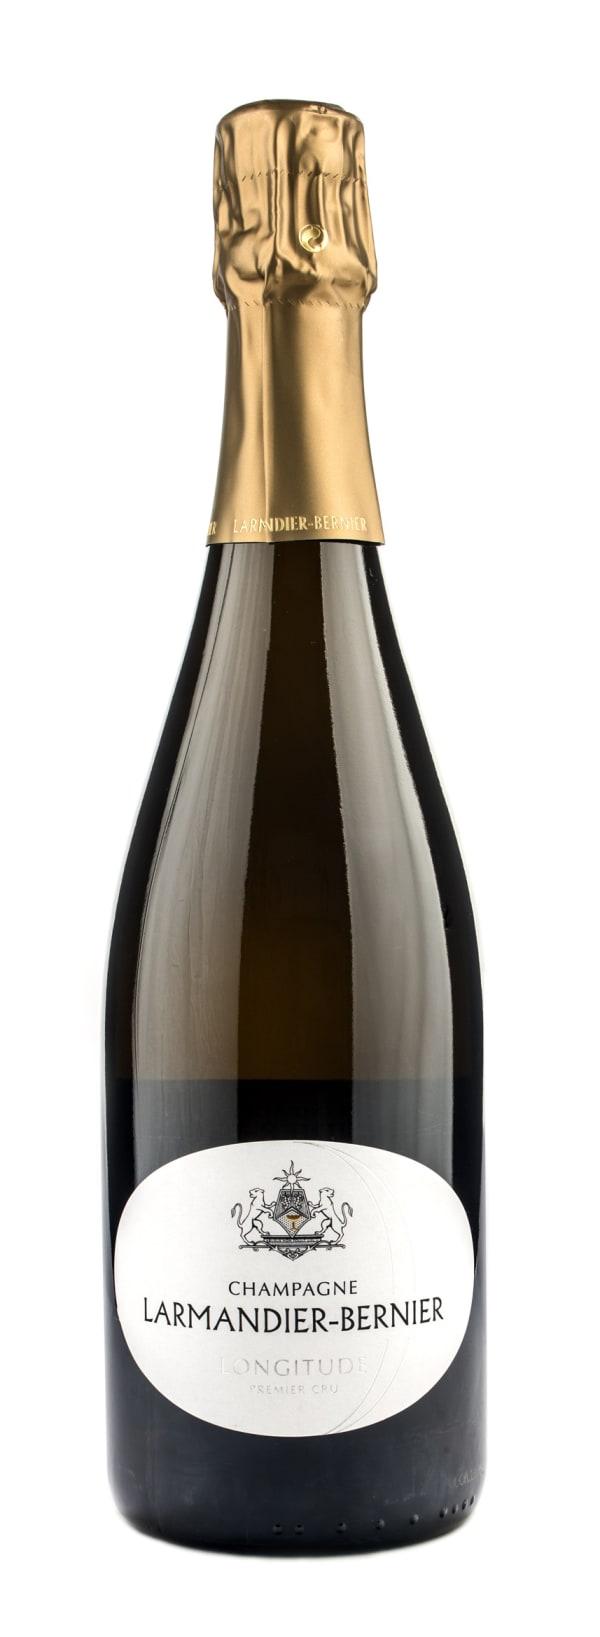 Larmandier-Bernier Longitude Premiere Cru Champagne Brut